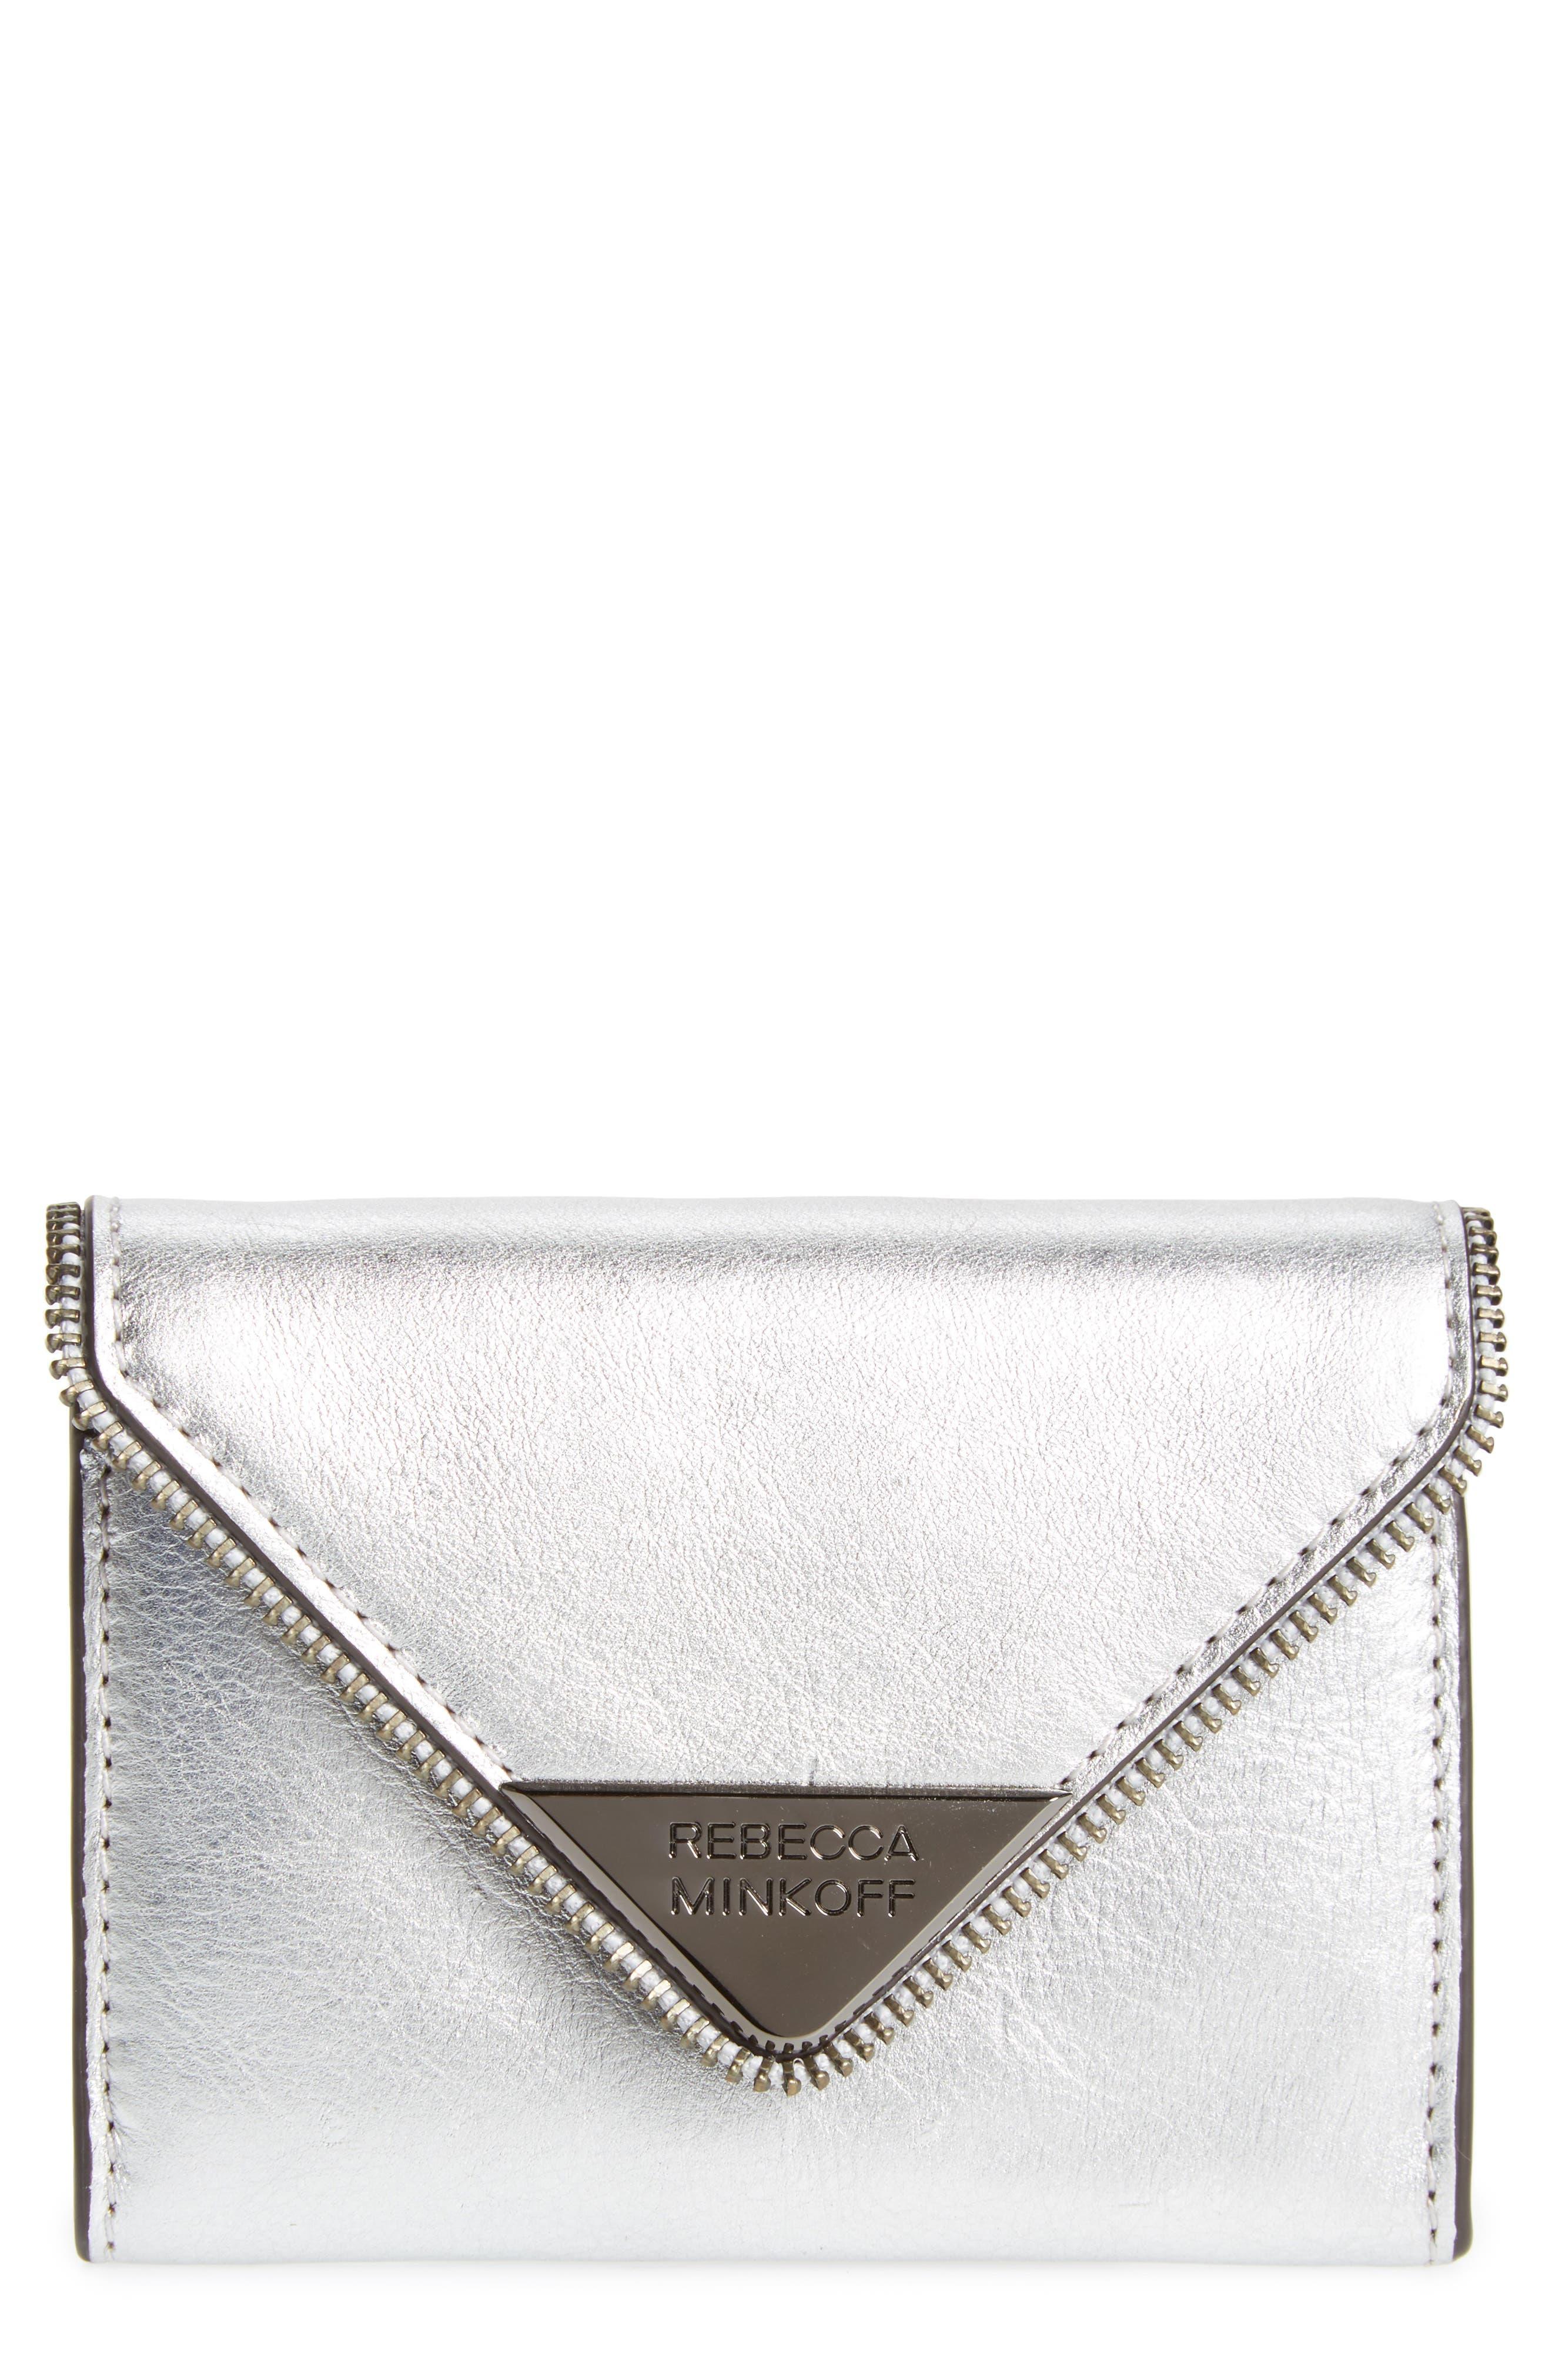 Rebecca Minkoff Molly Metro Metallic Leather Wallet